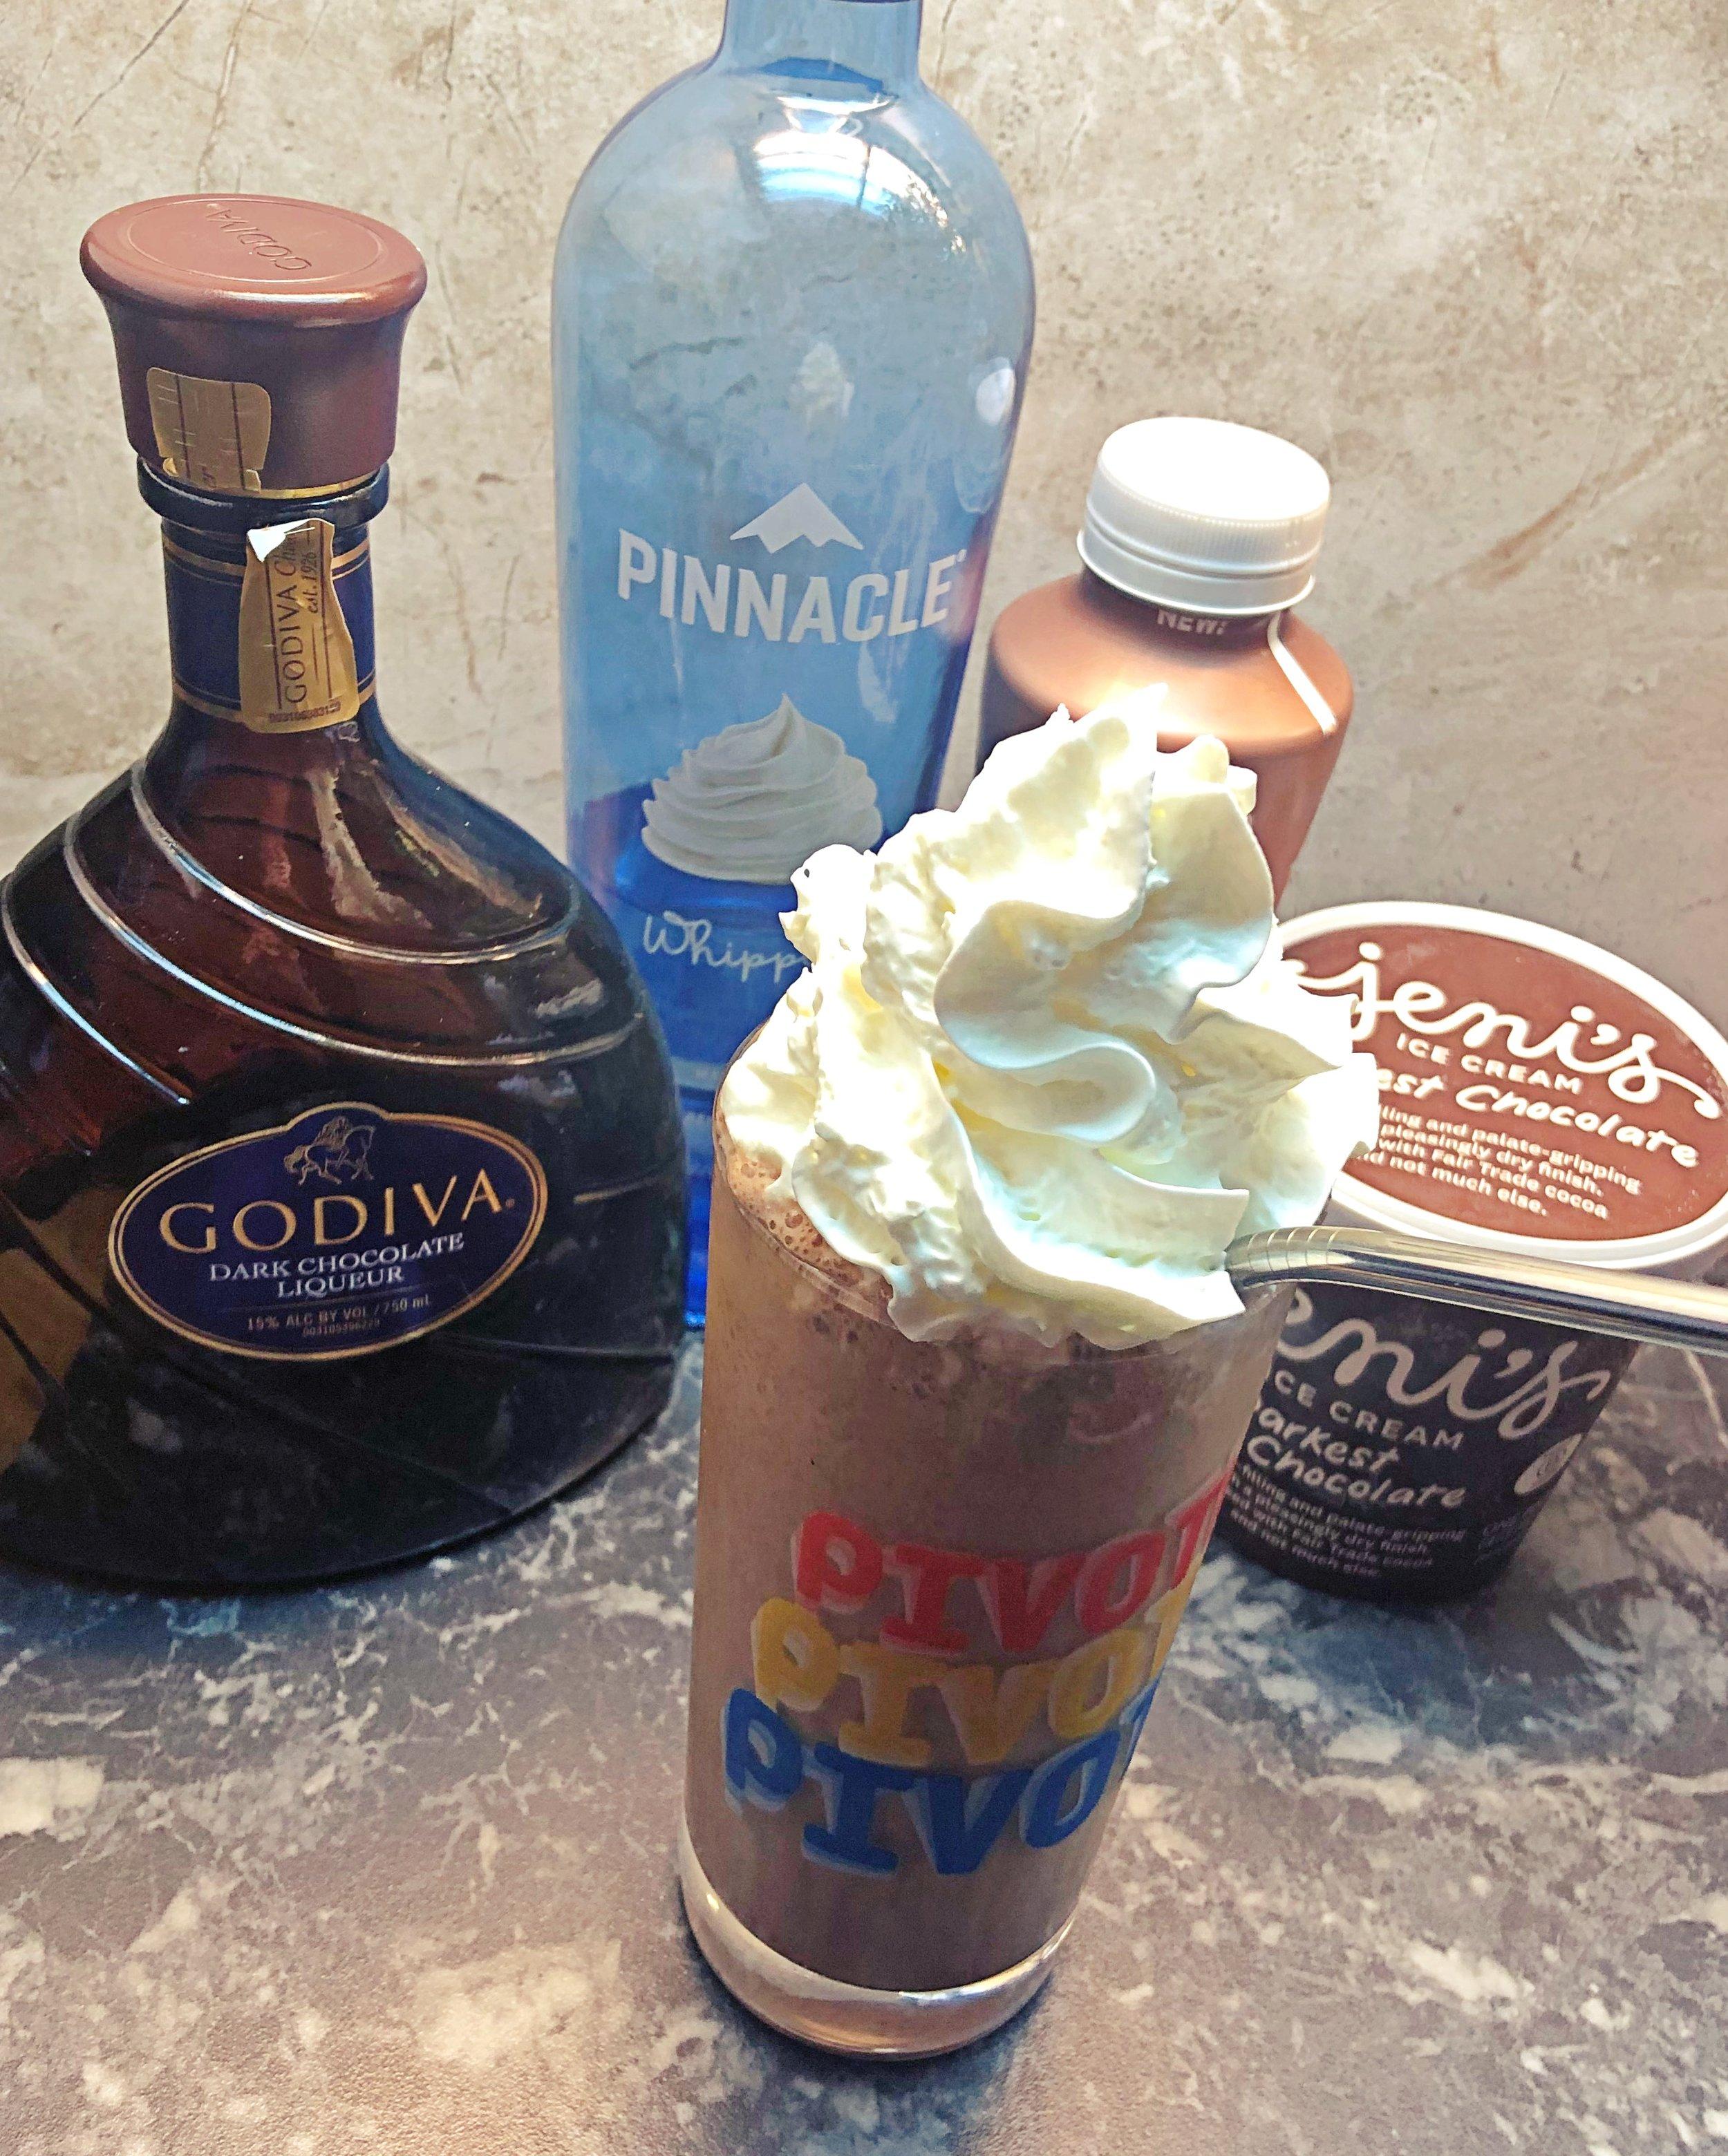 Elizabeth's Flingin' Flangin' Milkshake / Handbag Marinara / @handbagmarinara